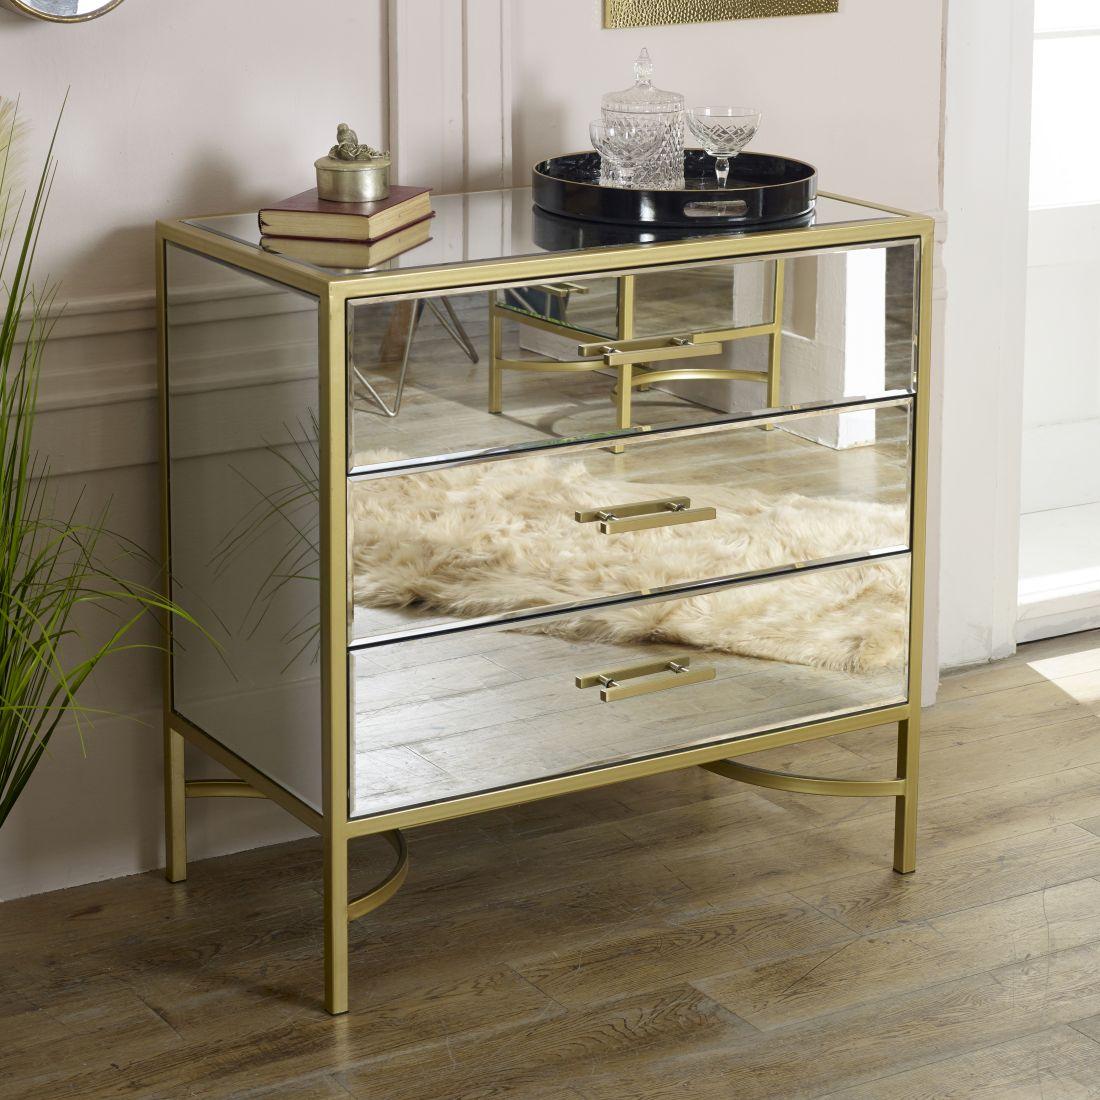 21melody-maison_gold-frame-mirrored-chest-of-drawers-venus-range.jpg